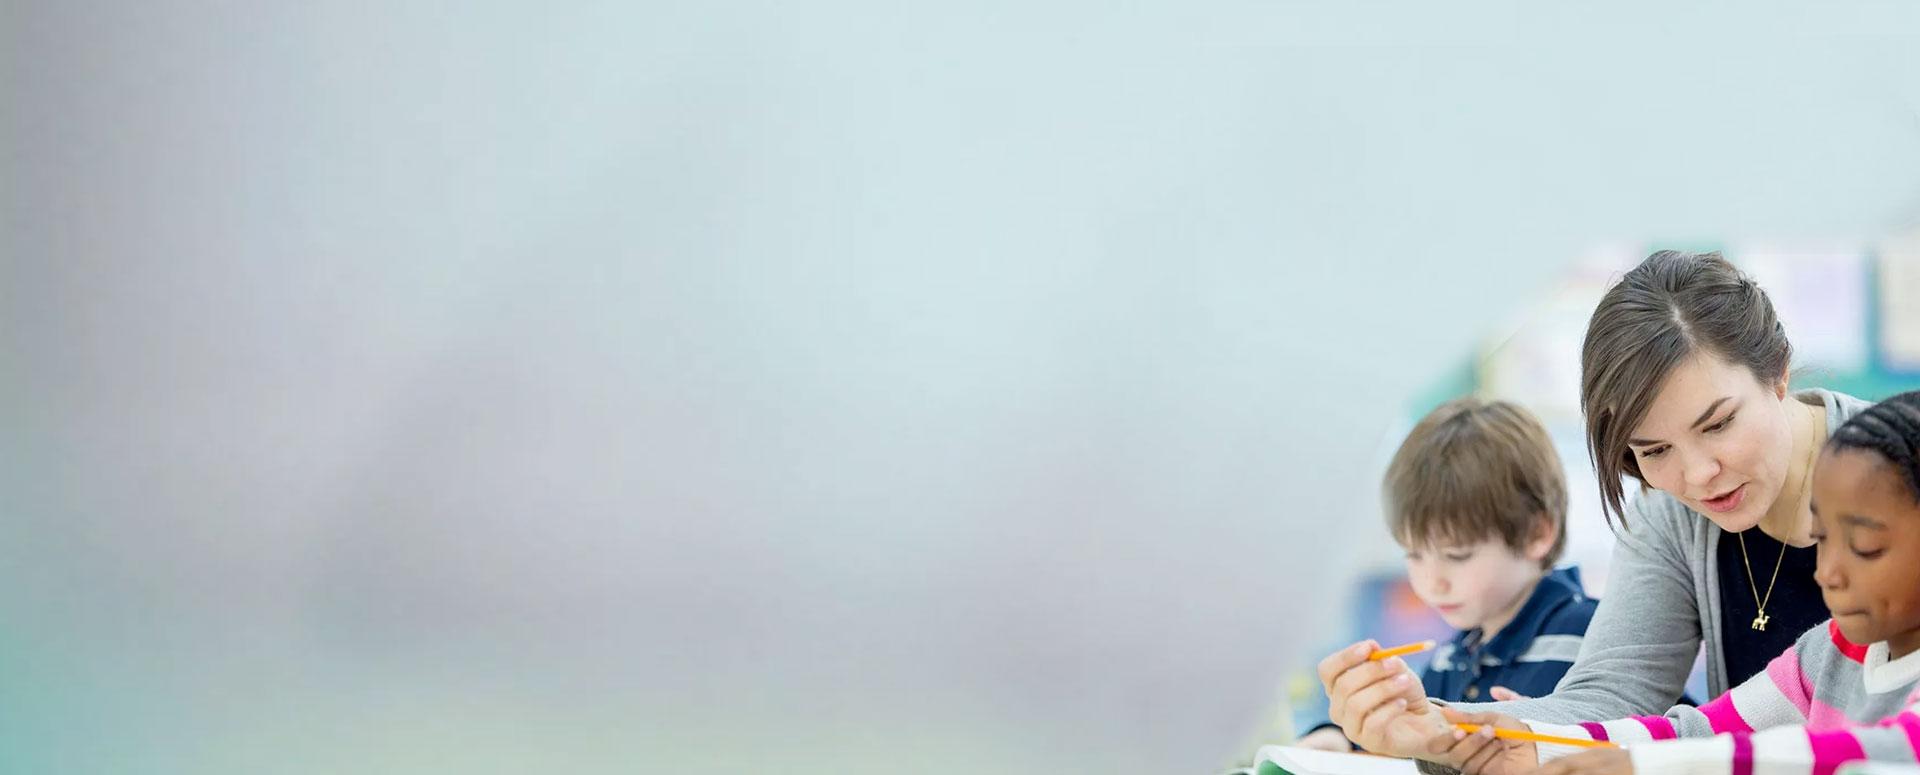 children-hearing-loss-school-age-child-1920x755